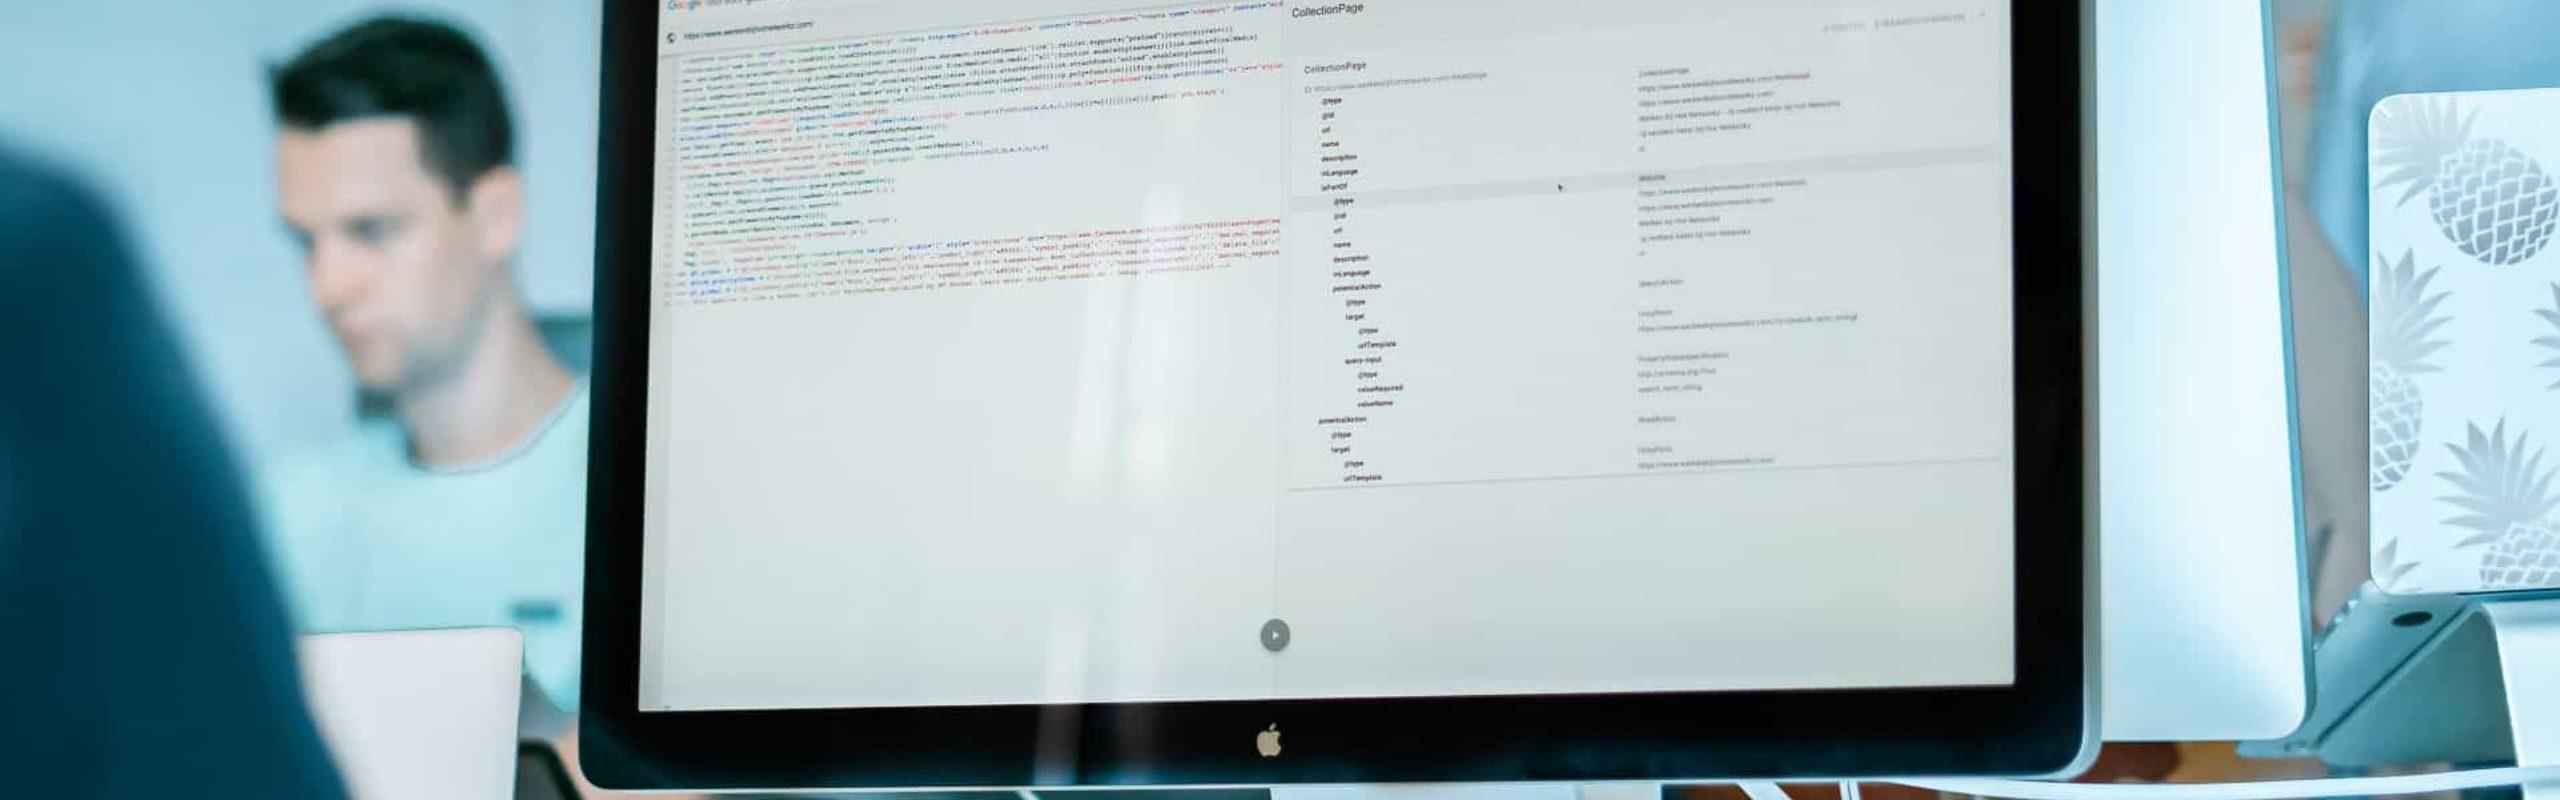 Blog - Google Jobs - Structured data